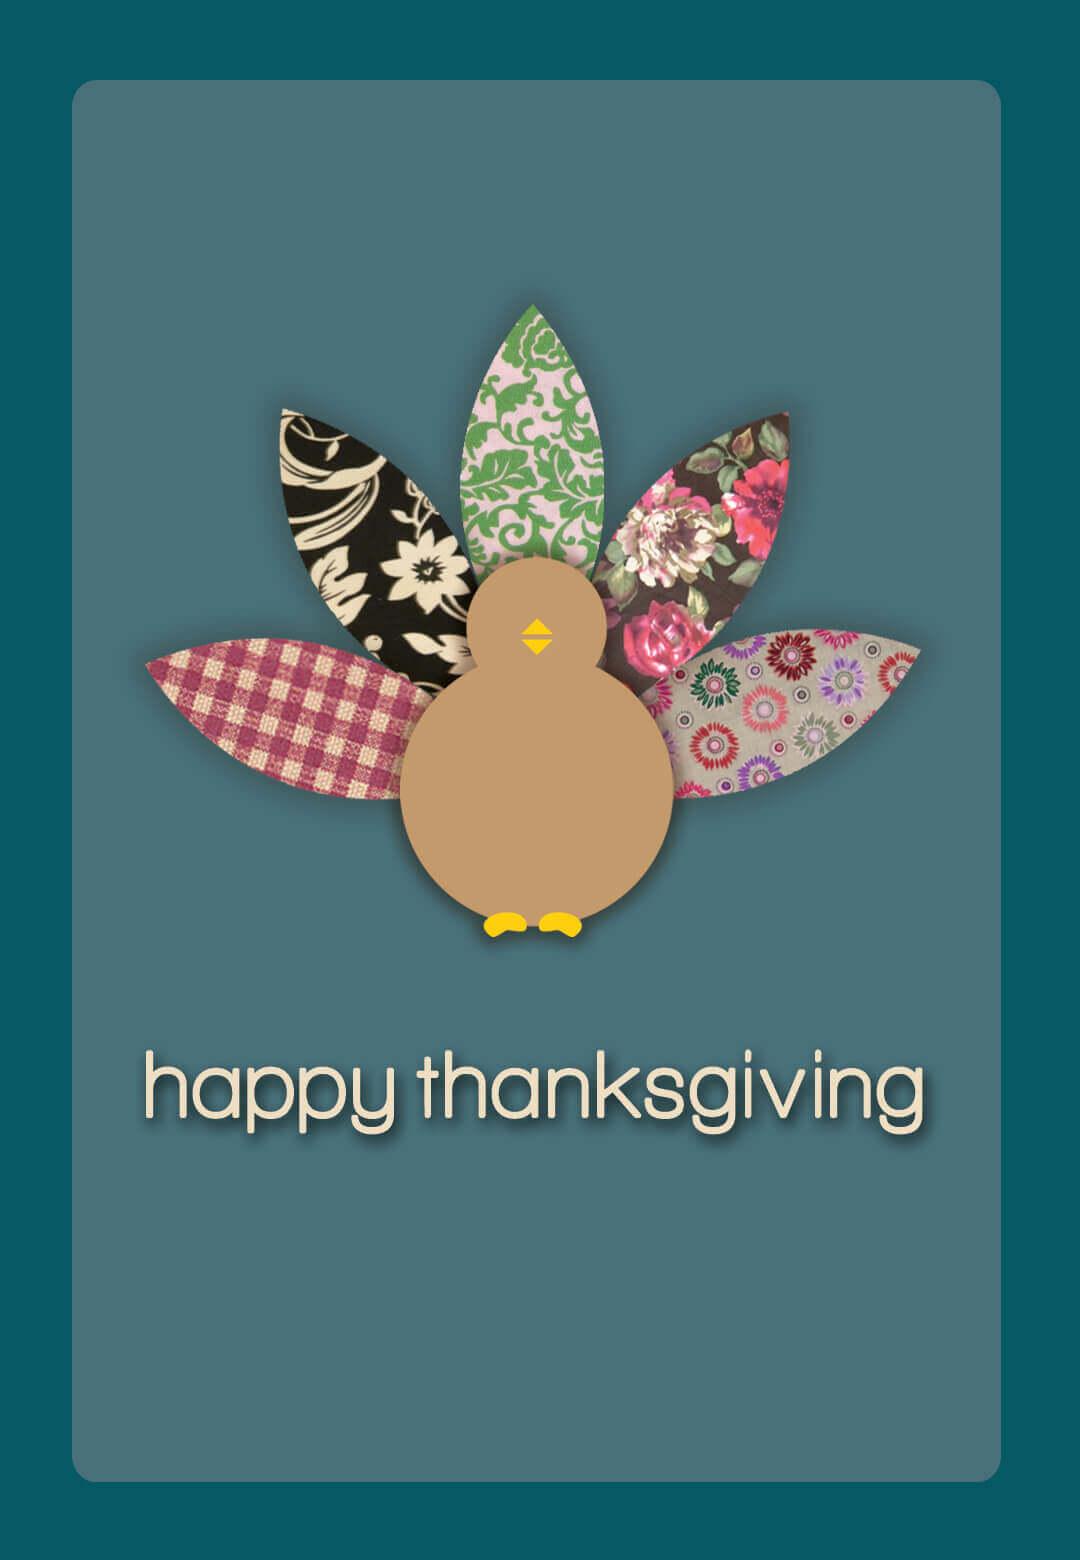 Thanksgiving 2019 Greeting Cards